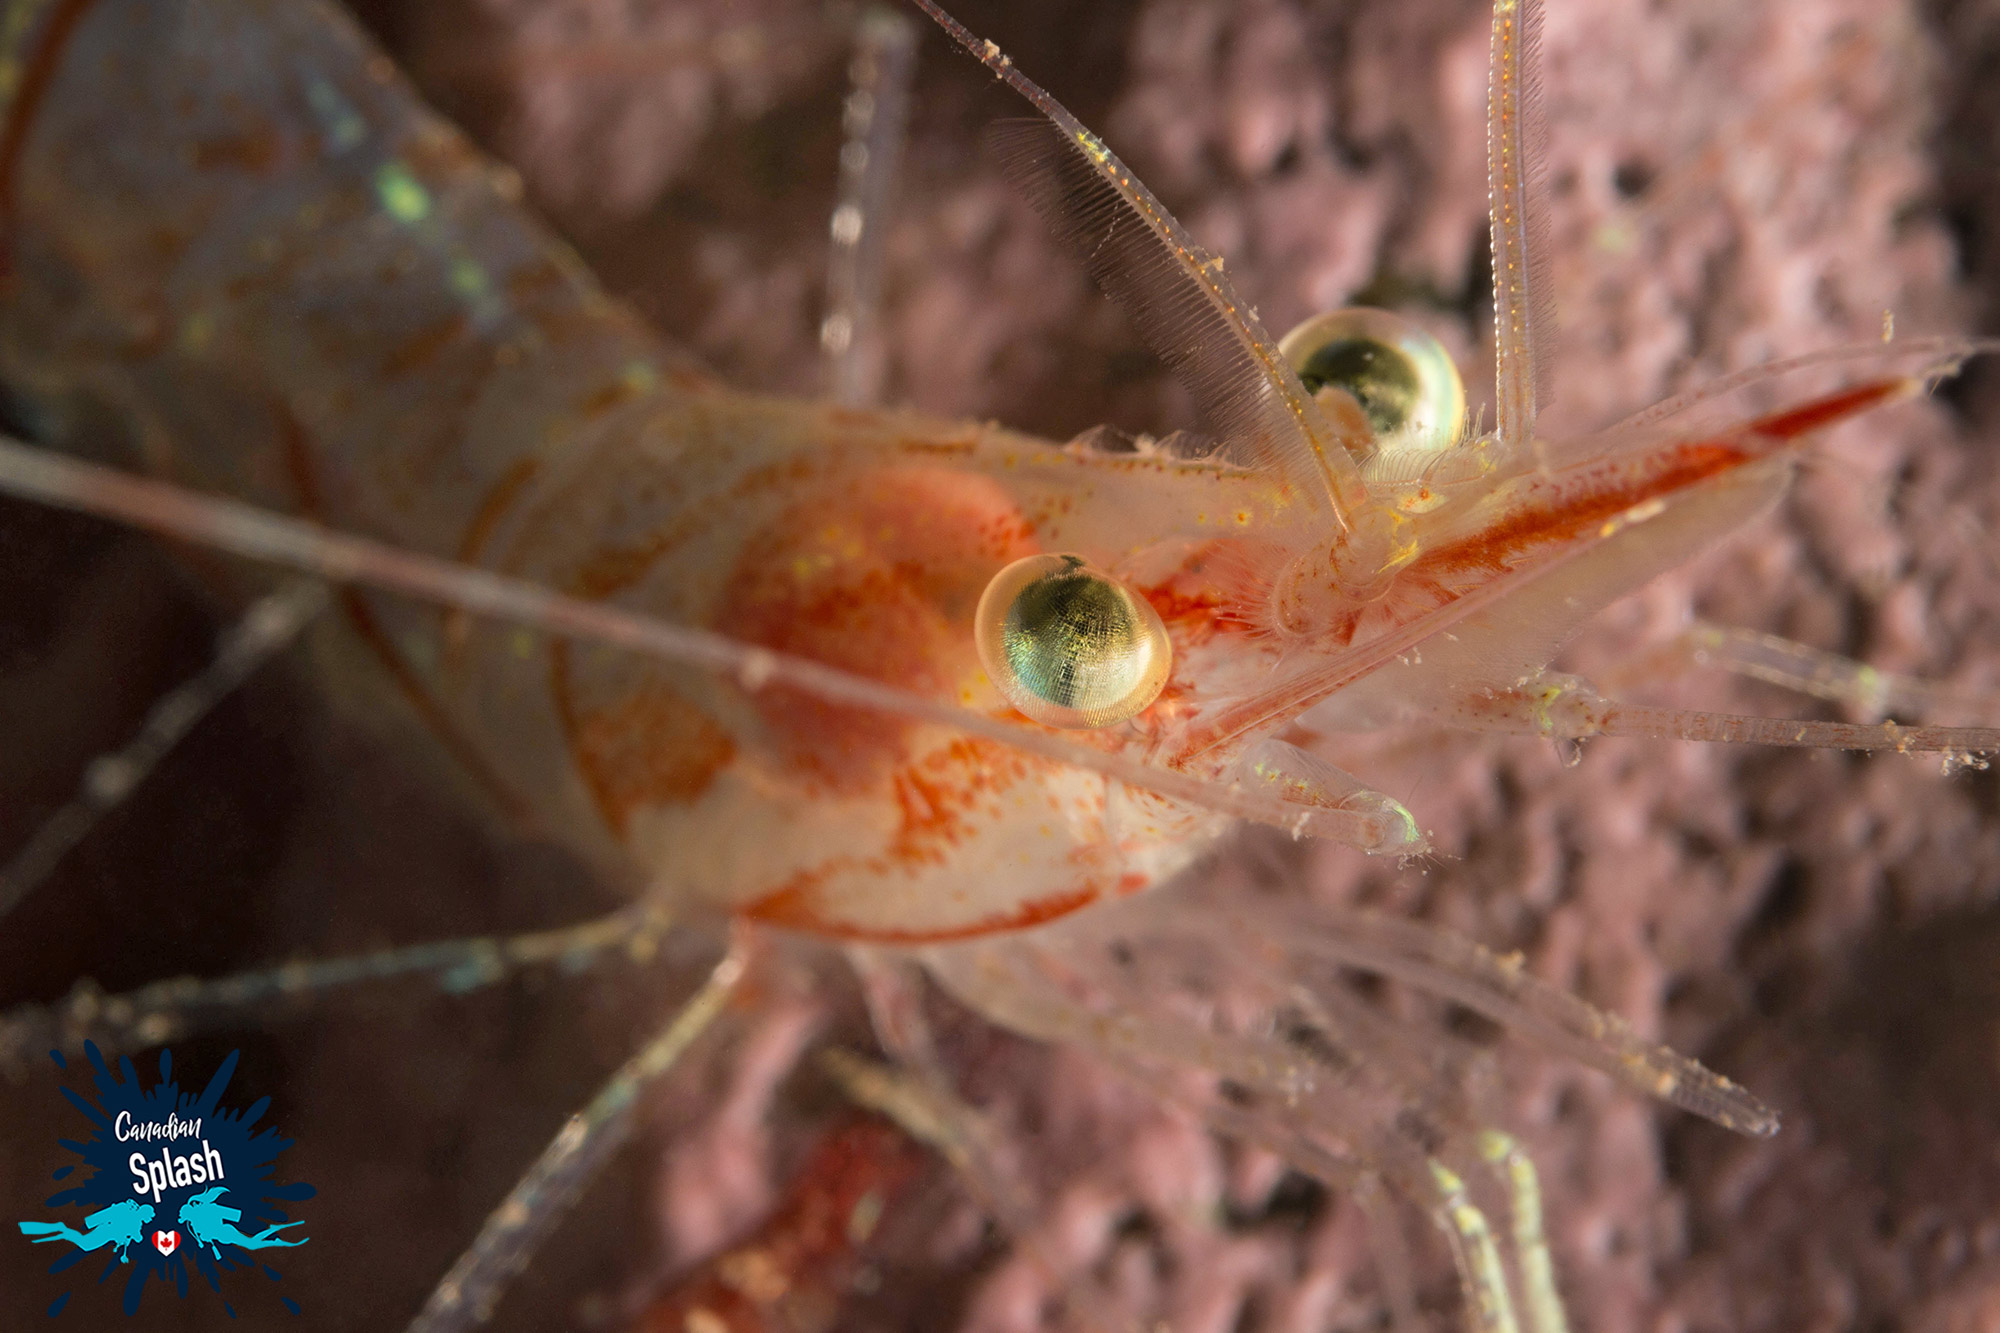 Grand Manan Close Up Of A Shrimp, Scuba Diving New Brunswick, Canada